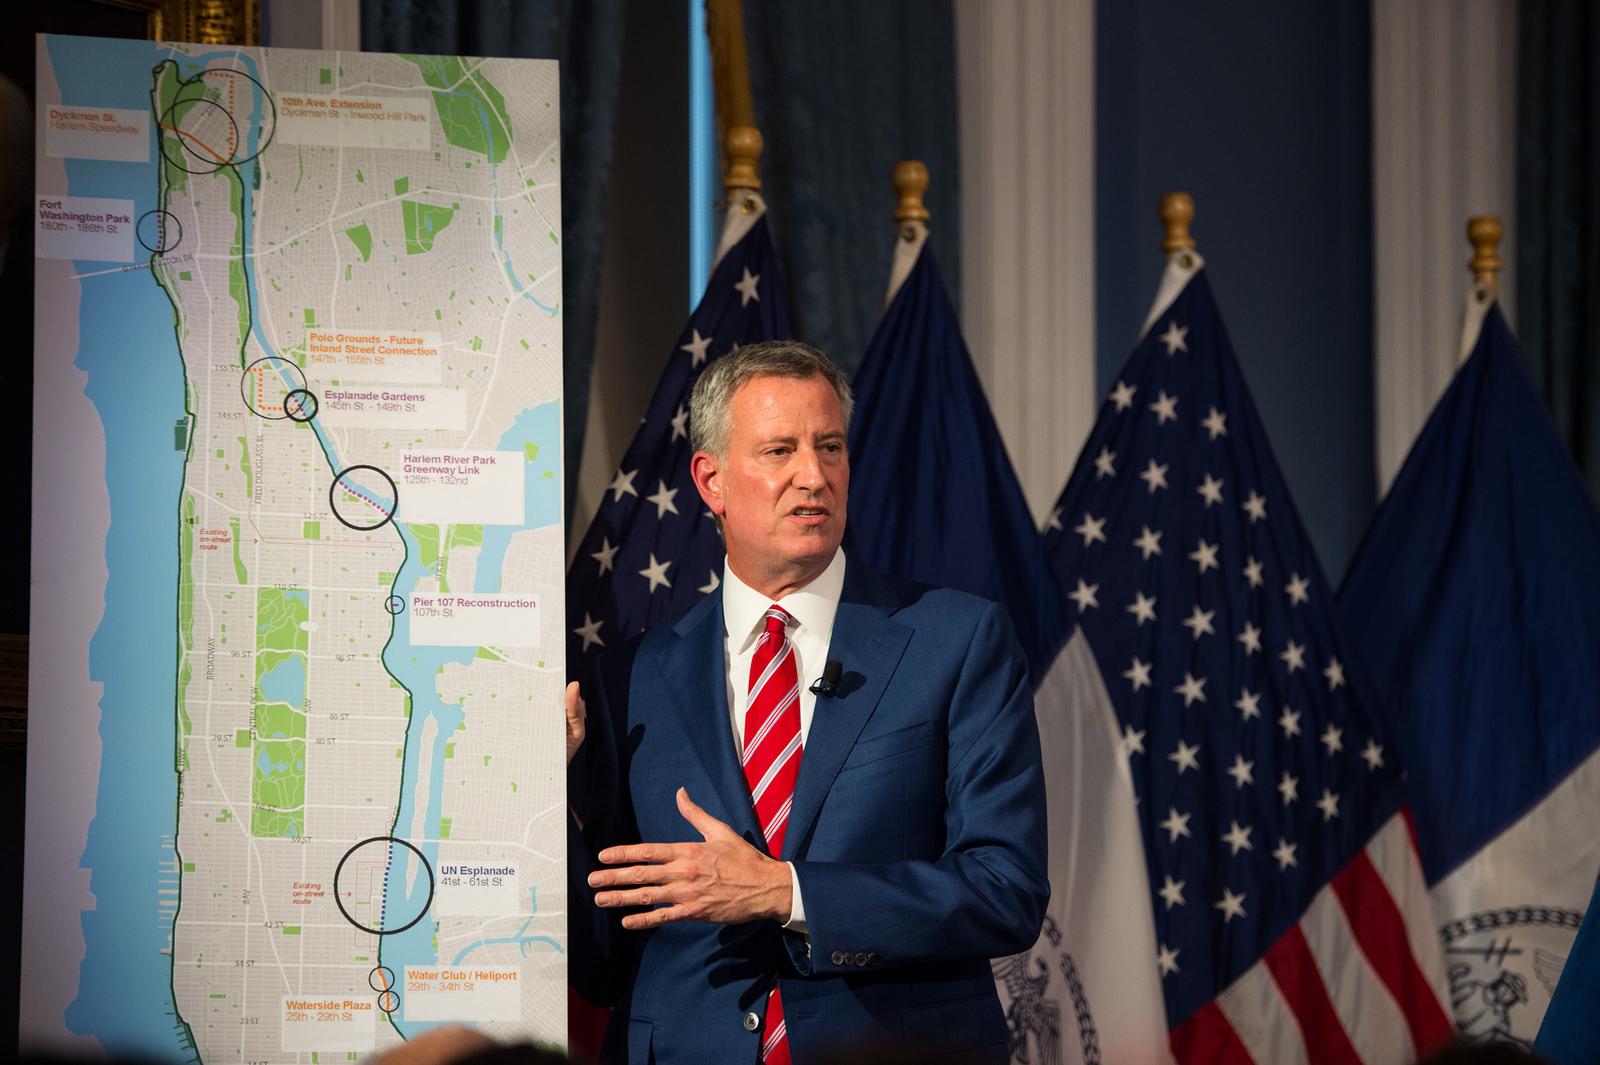 New York City Mayor Bill de Blasio unveils his executive budget.